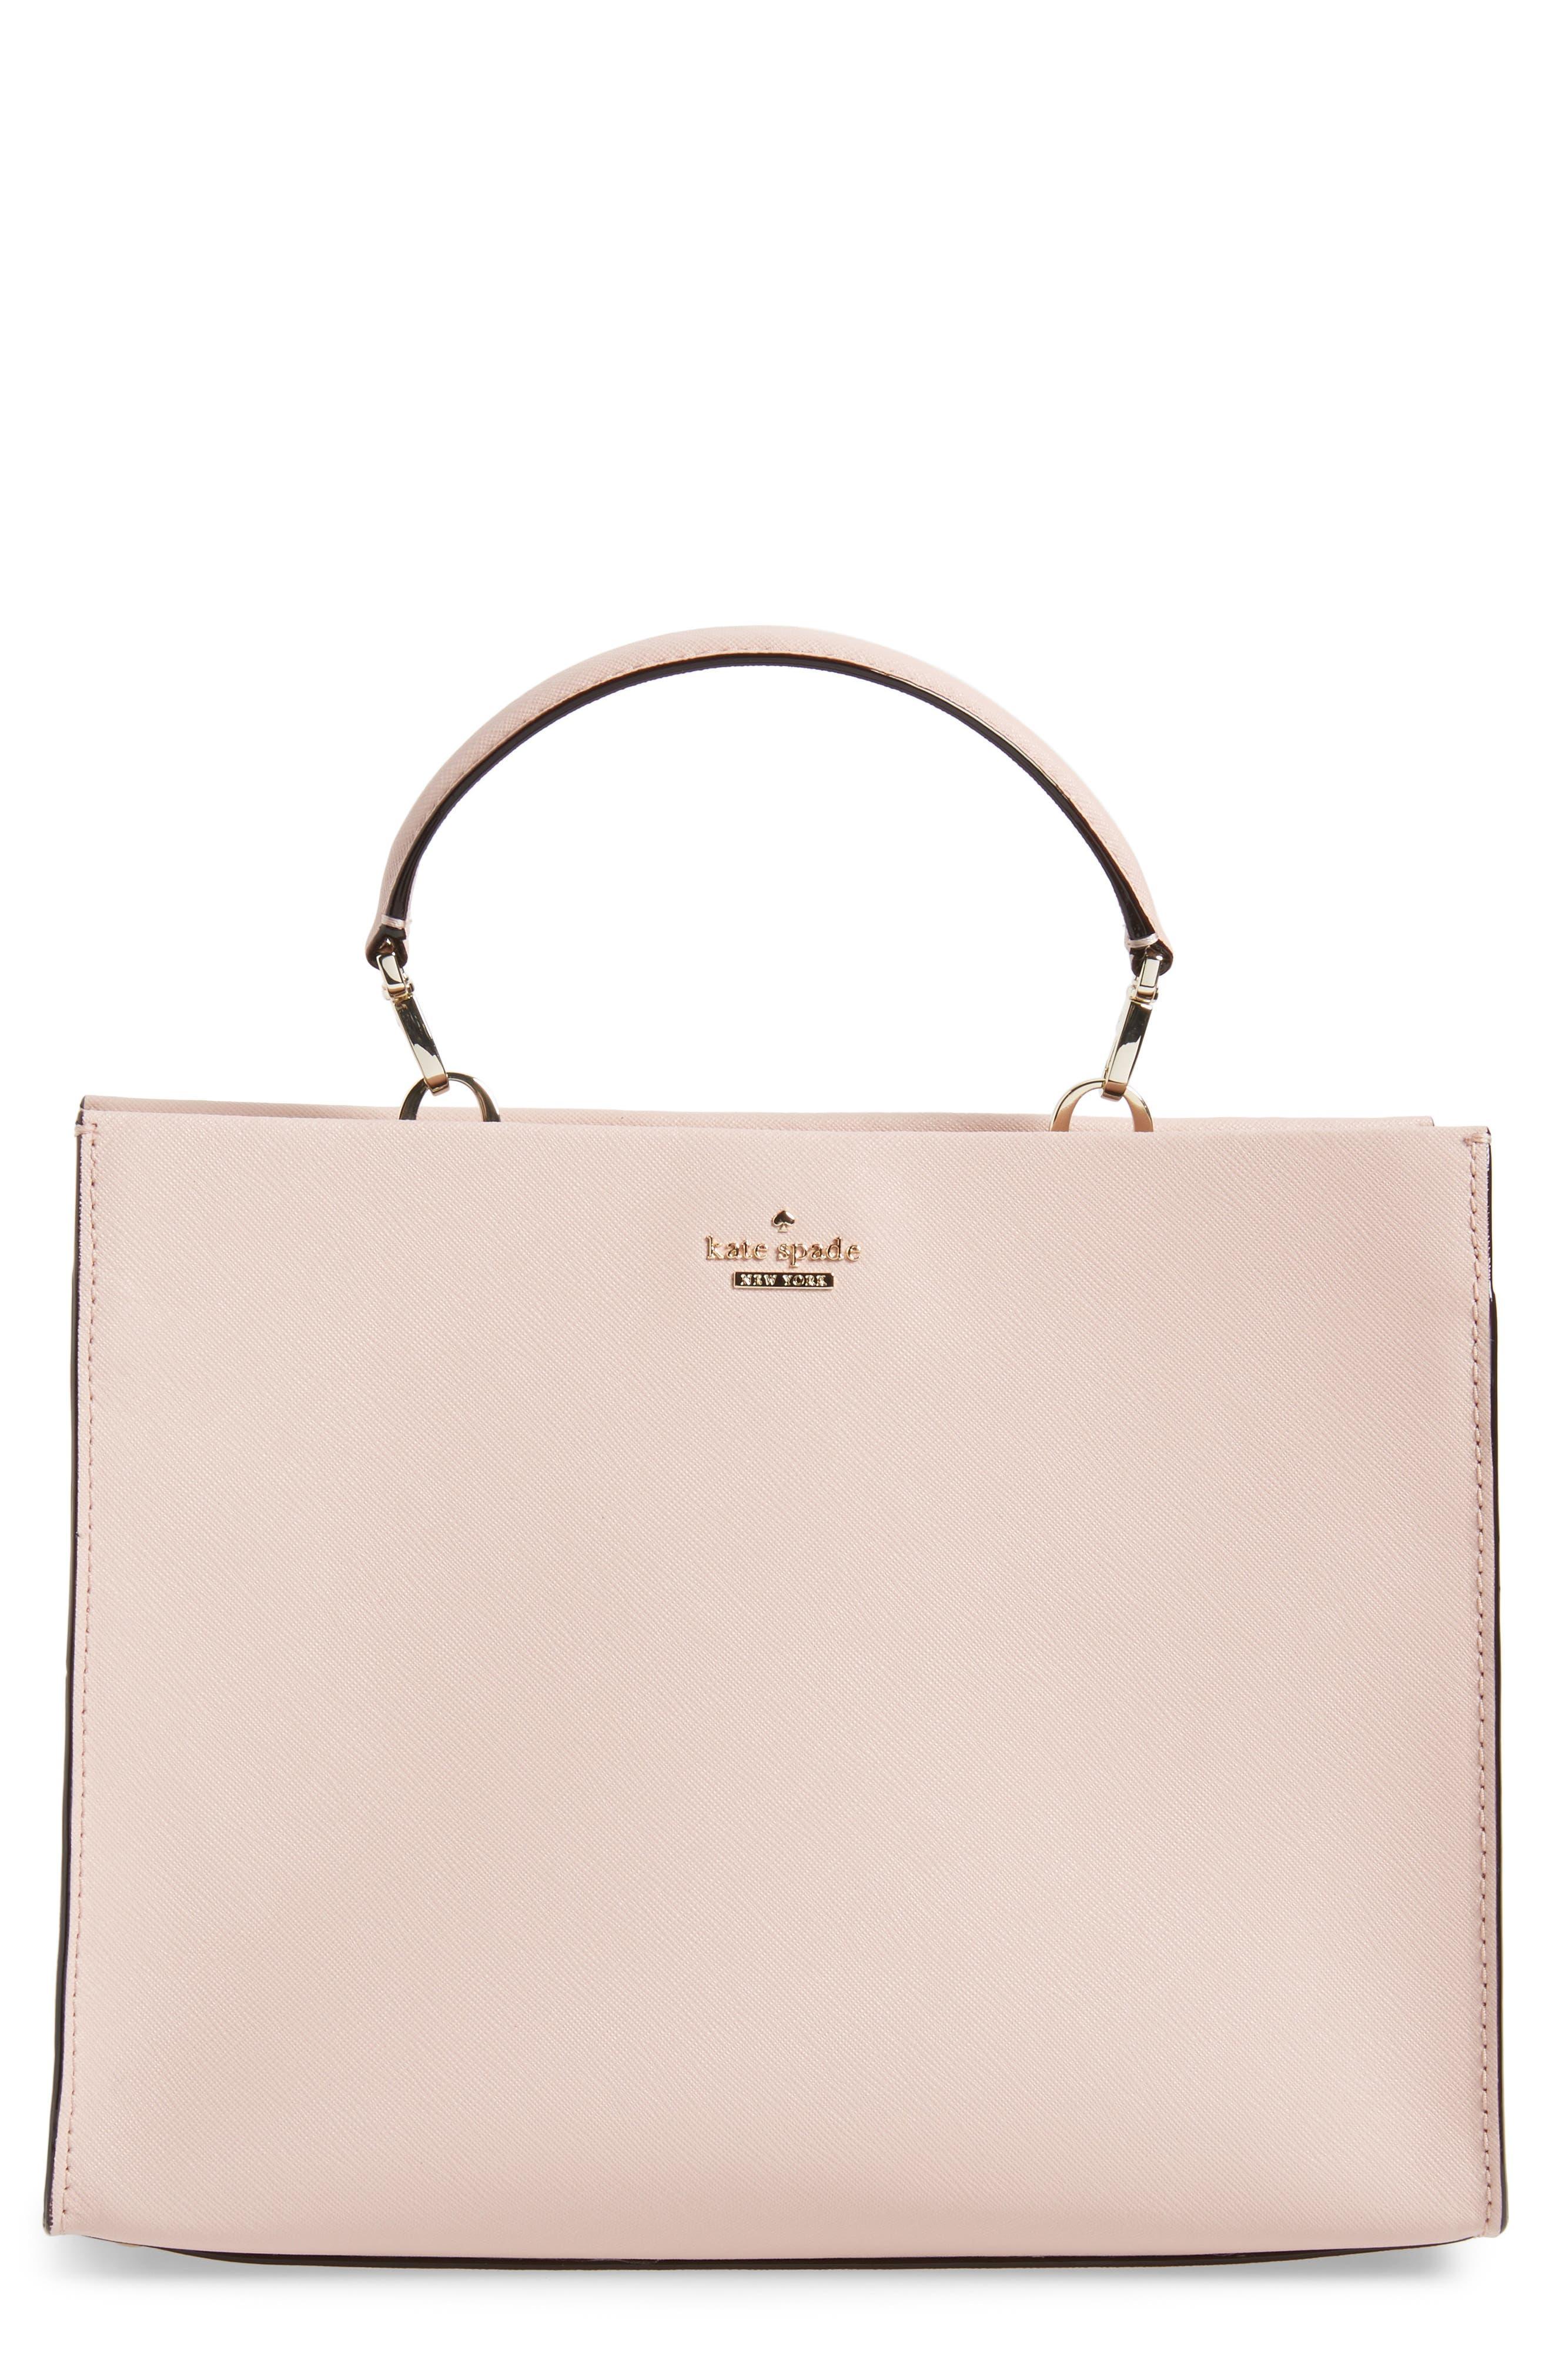 cameron street - sara leather satchel,                             Main thumbnail 1, color,                             Warm Vellum